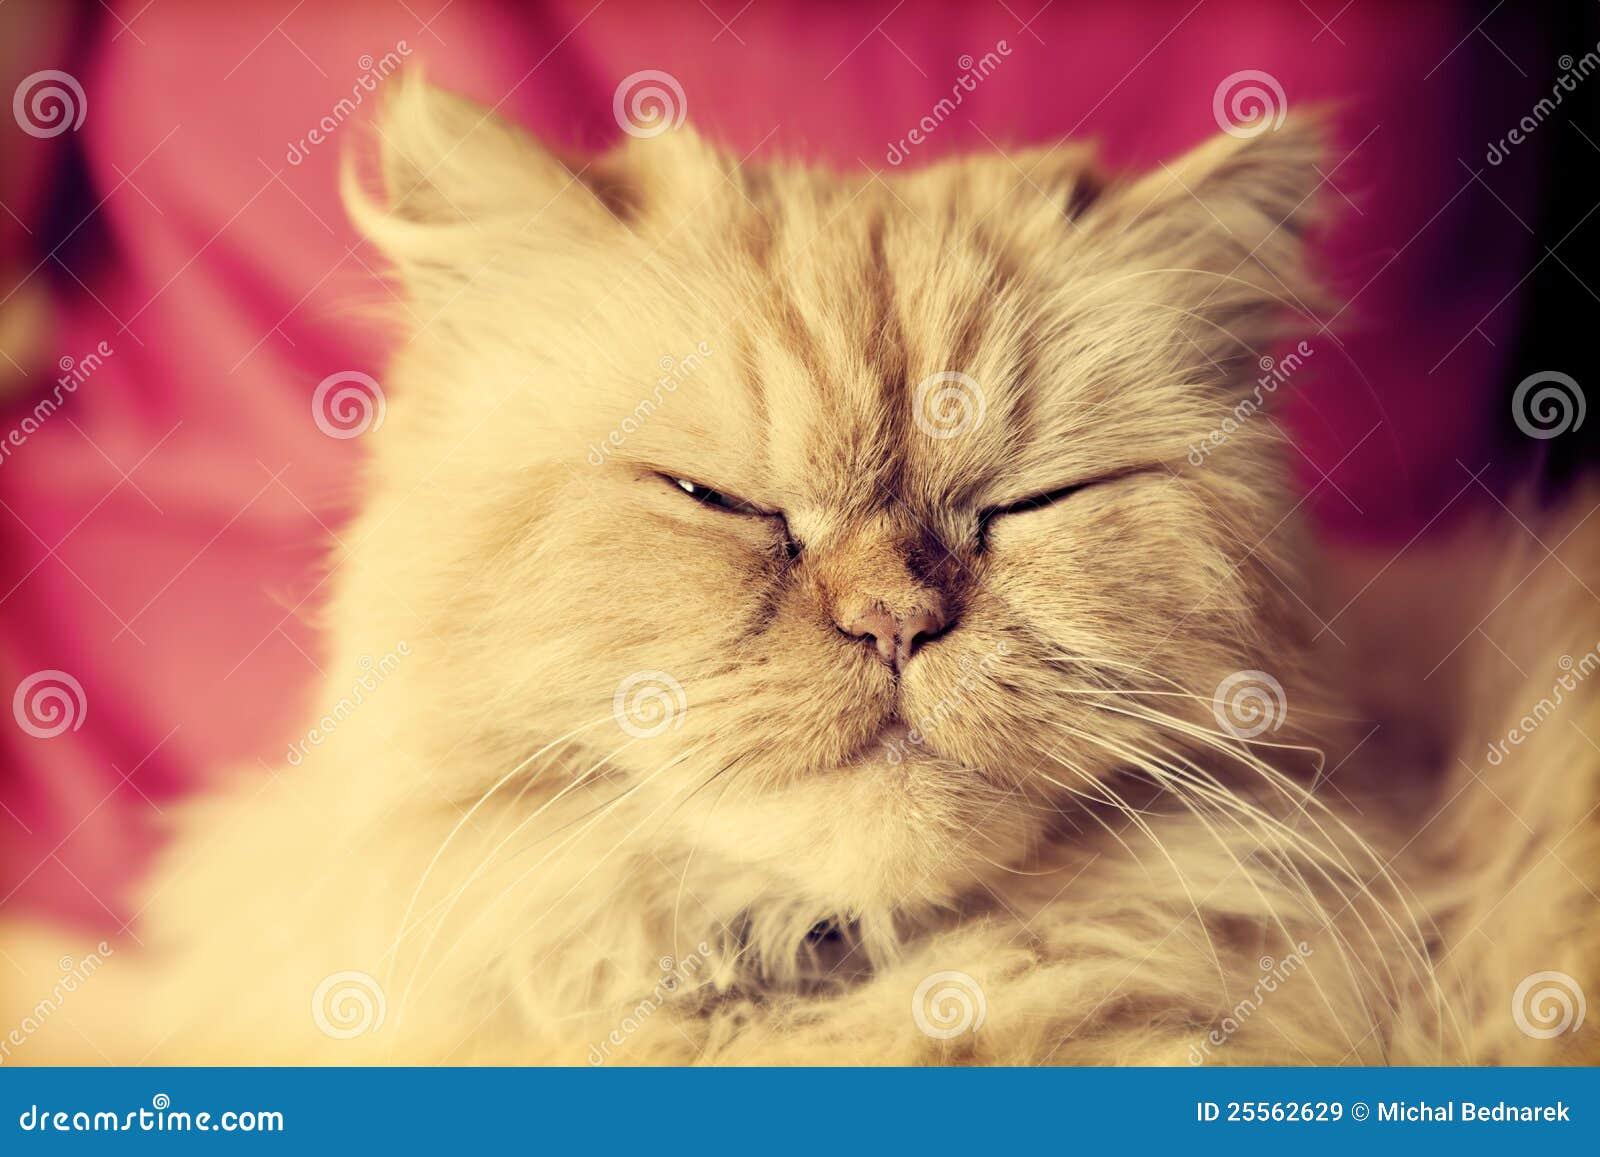 Gato persa bonito que olha relaxado